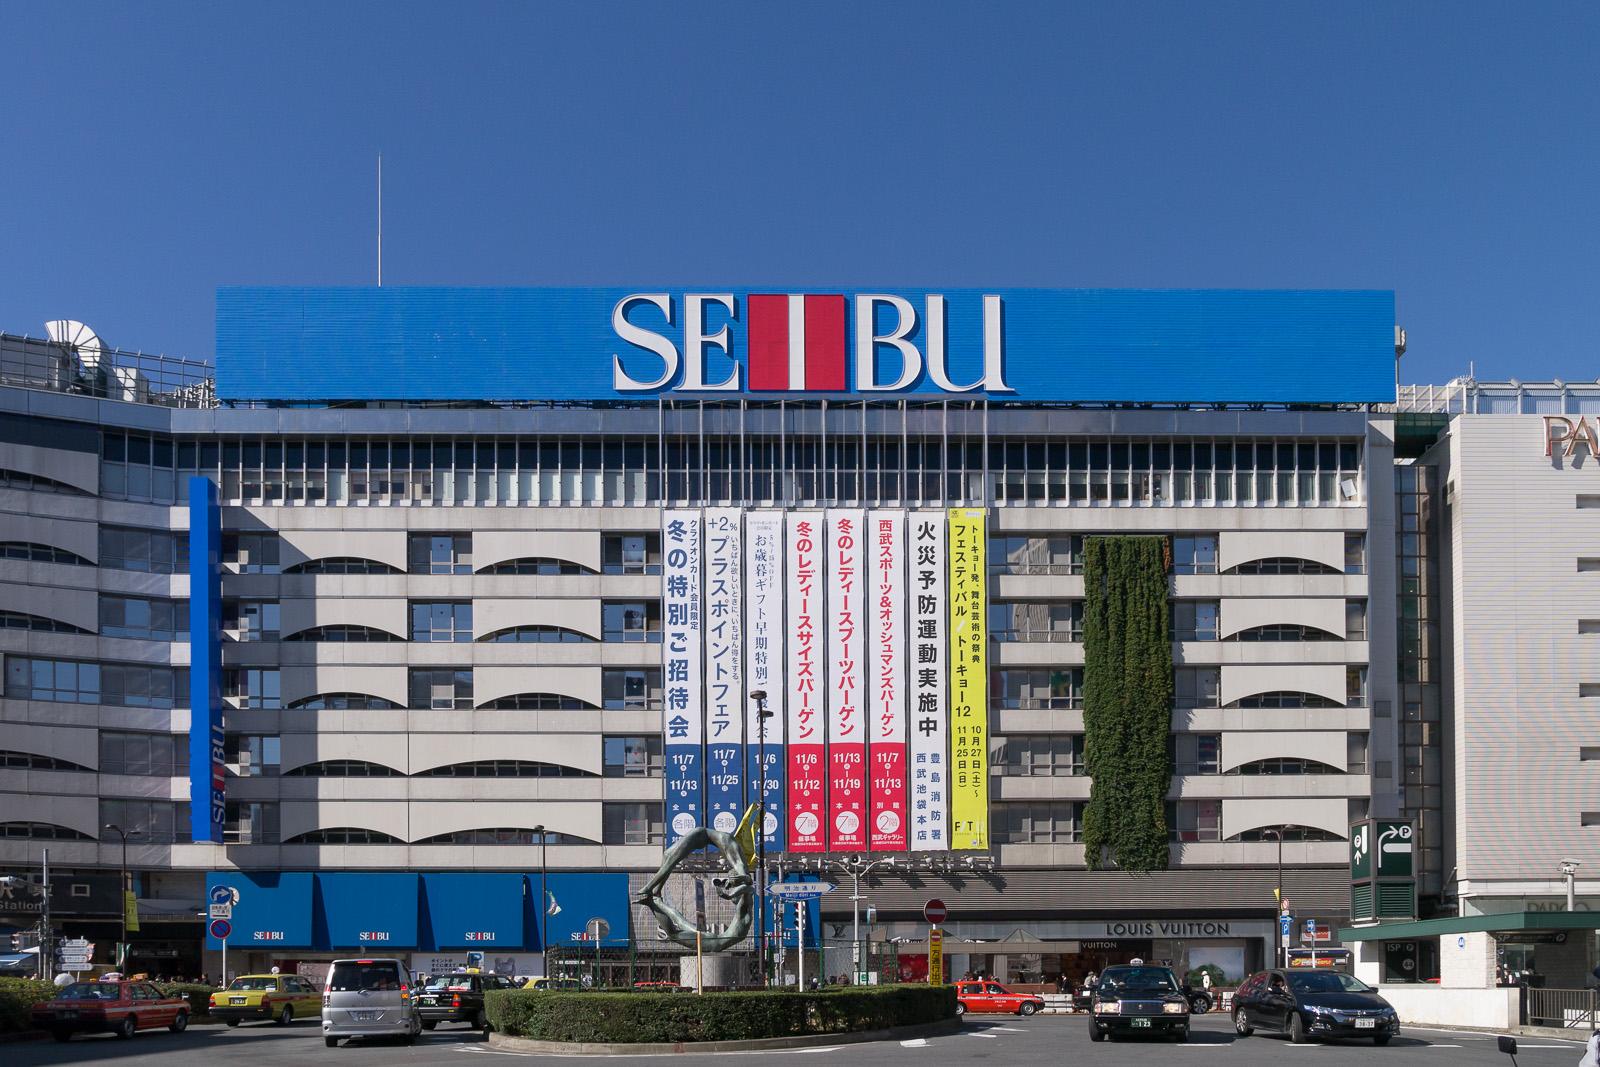 Seibu department store ikebukuro 01